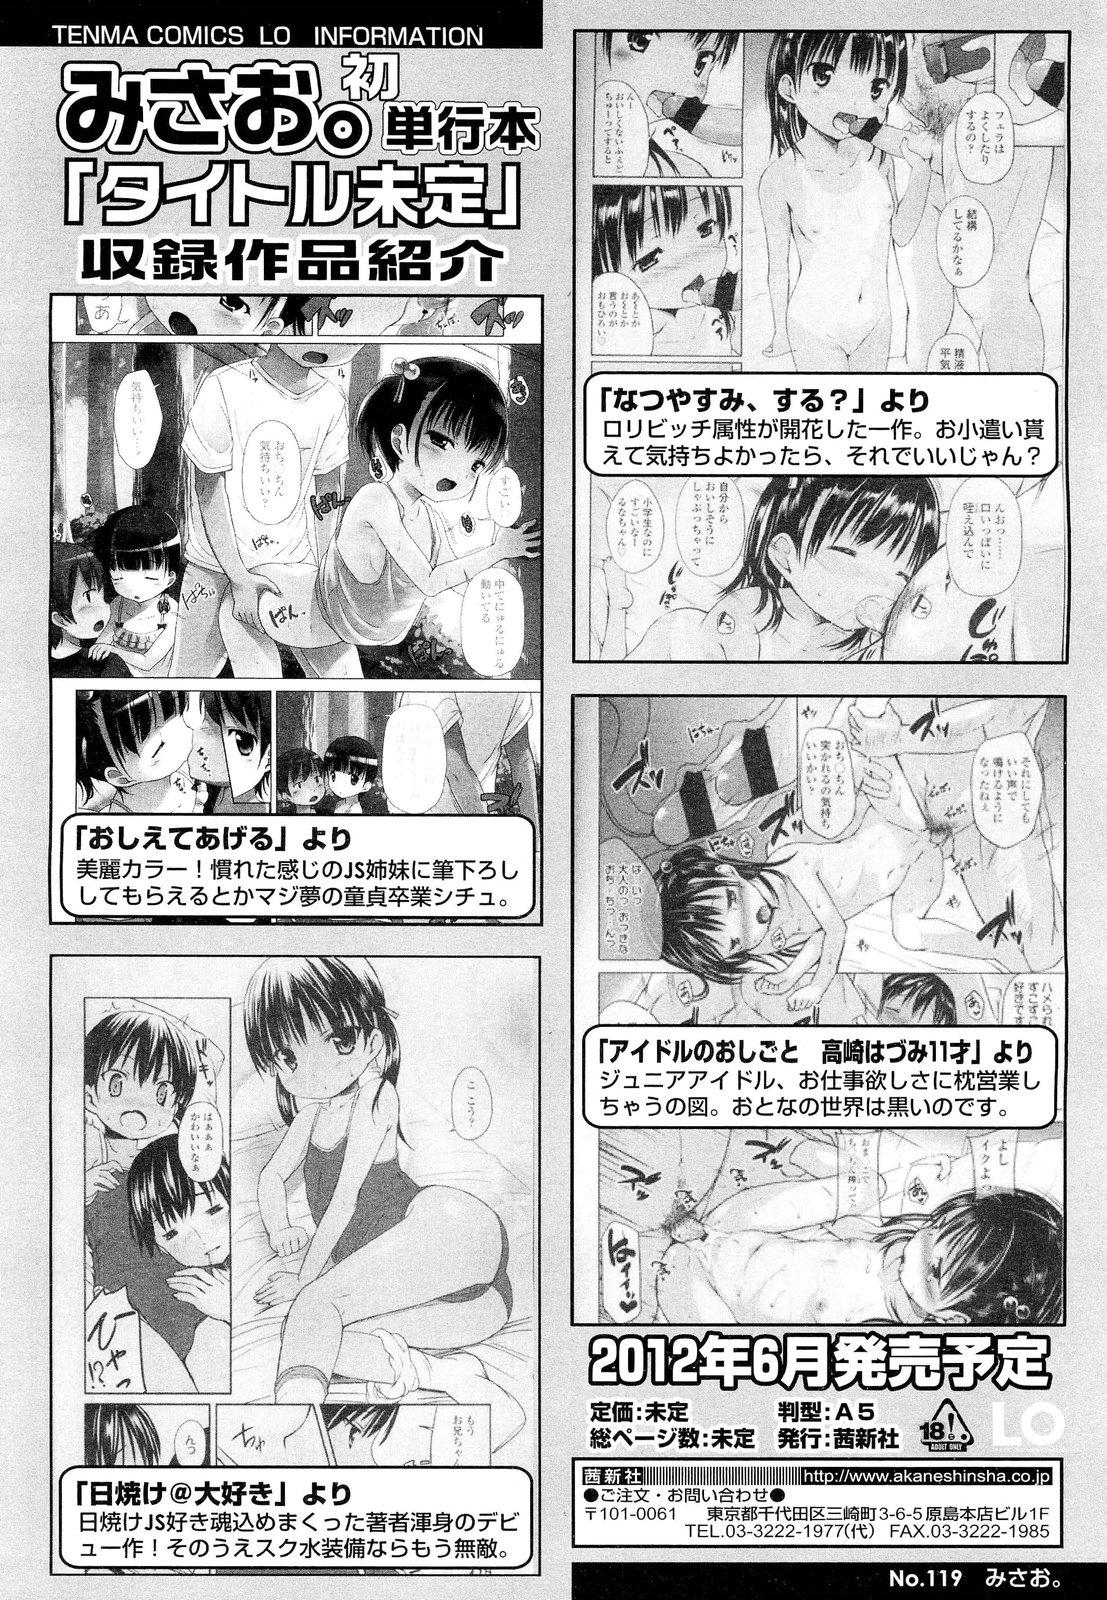 COMIC LO 2012-05 Vol. 98 49